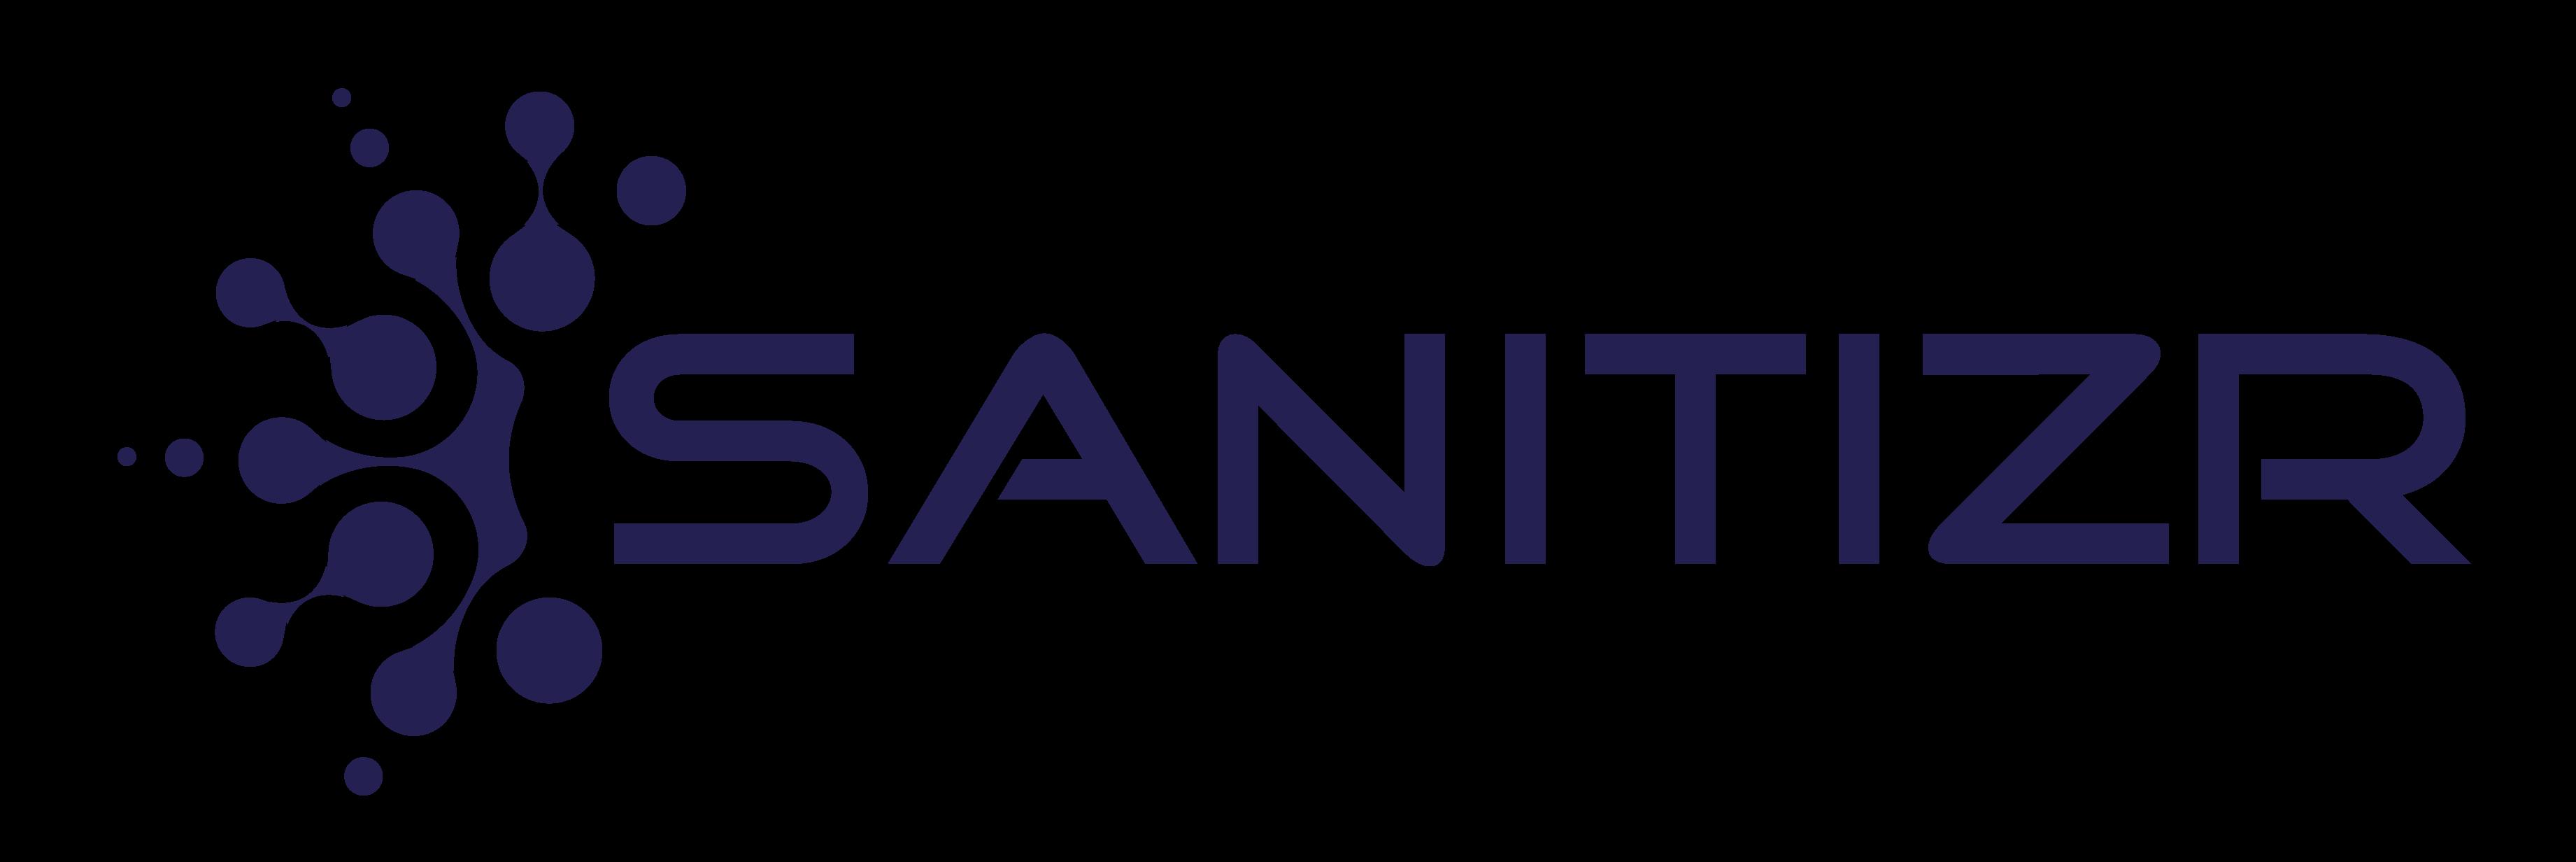 UV Sanitizing Light Company, Sanitizr™, Launches the Most Powerful Consumer-Grade UV Sanitizing Wand